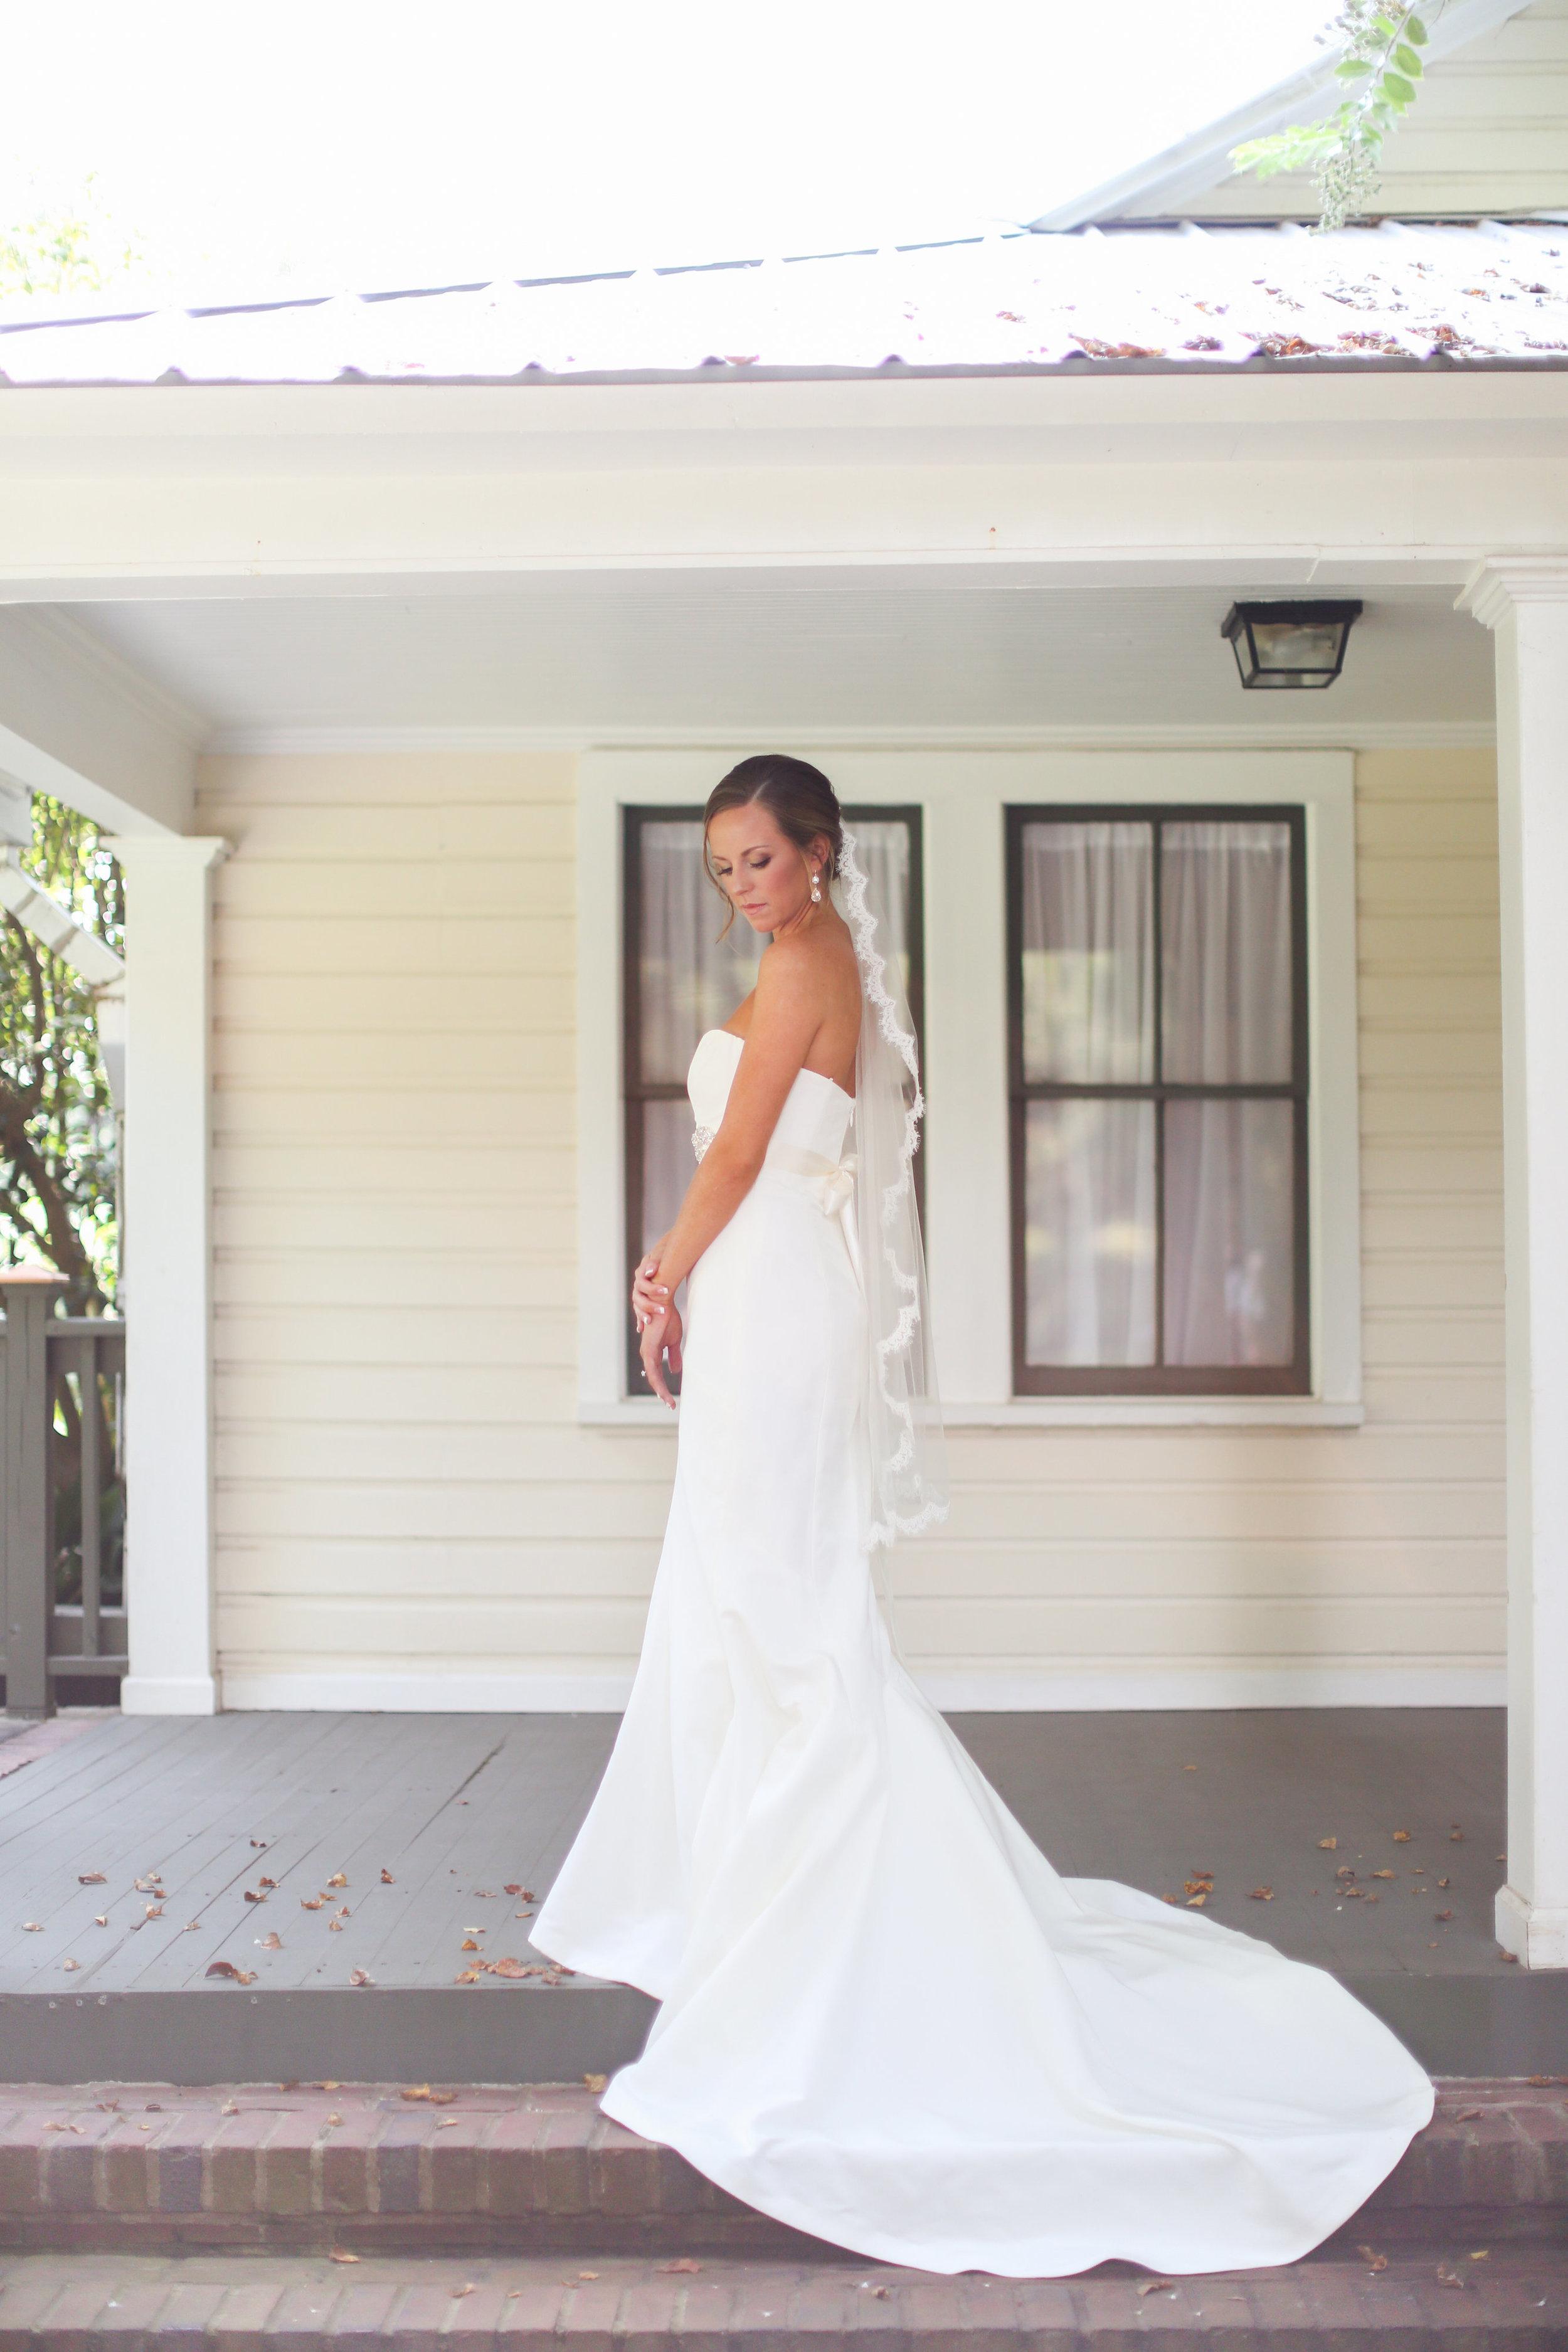 finnegan-photography-ivory-and-beau-bridal-boutique-nicole-miller-dakota-jaclyn-jordan-anne-veil-savannah-bridal-boutique-savannah-wedding-dresses-savannah-weddings-statesboro-wedding-barn-wedding-savannah-bridal-georgia-bridal-boutique-8.jpg